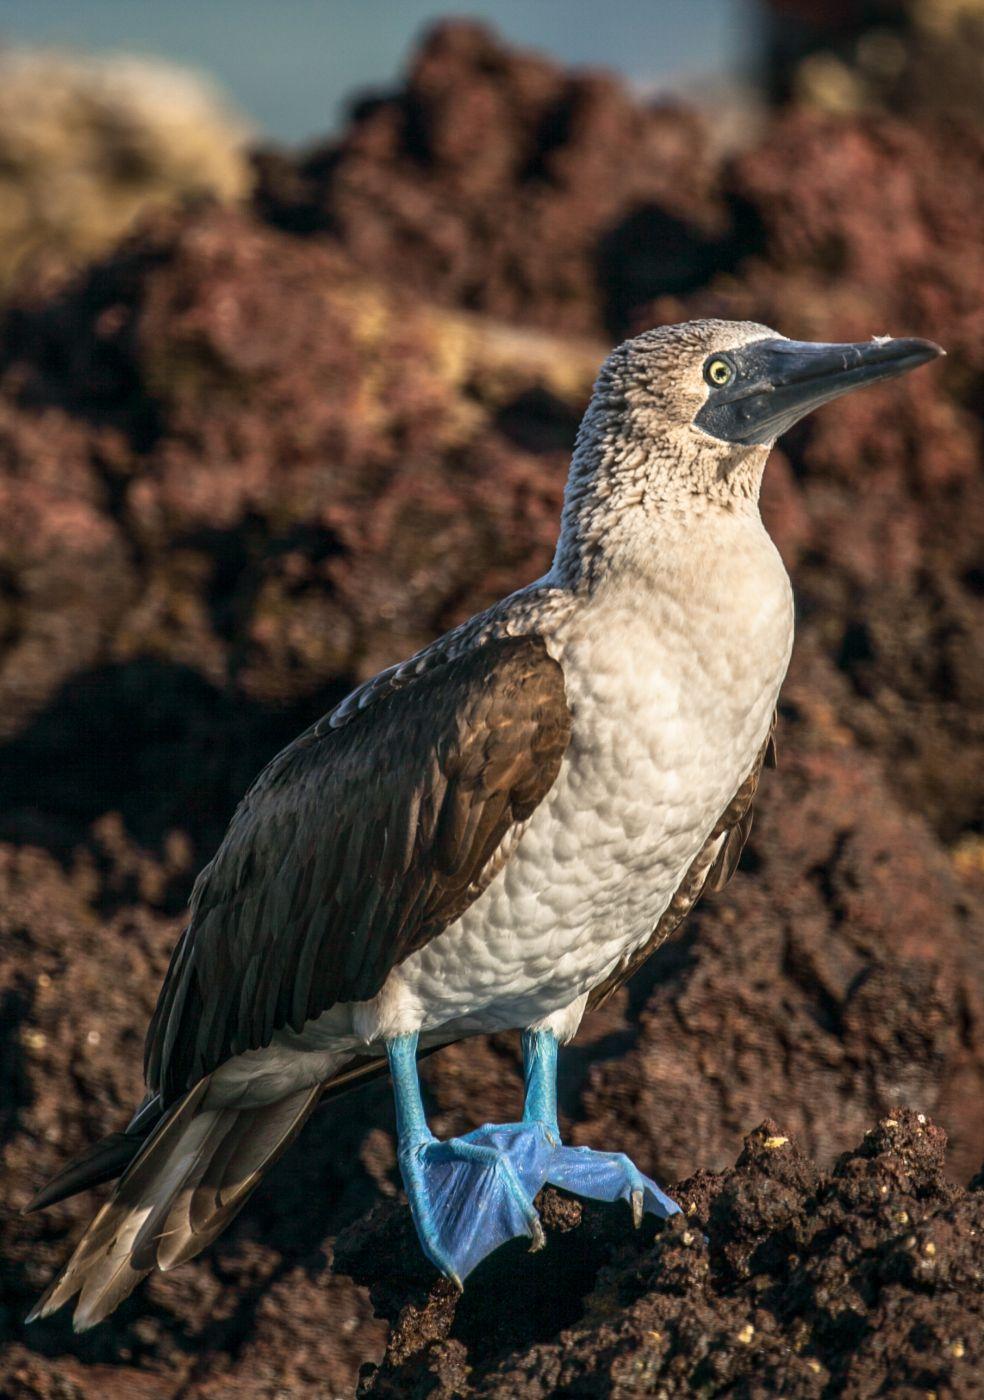 Blue Footed Booby seabird Galapagos Islands, Ecuador